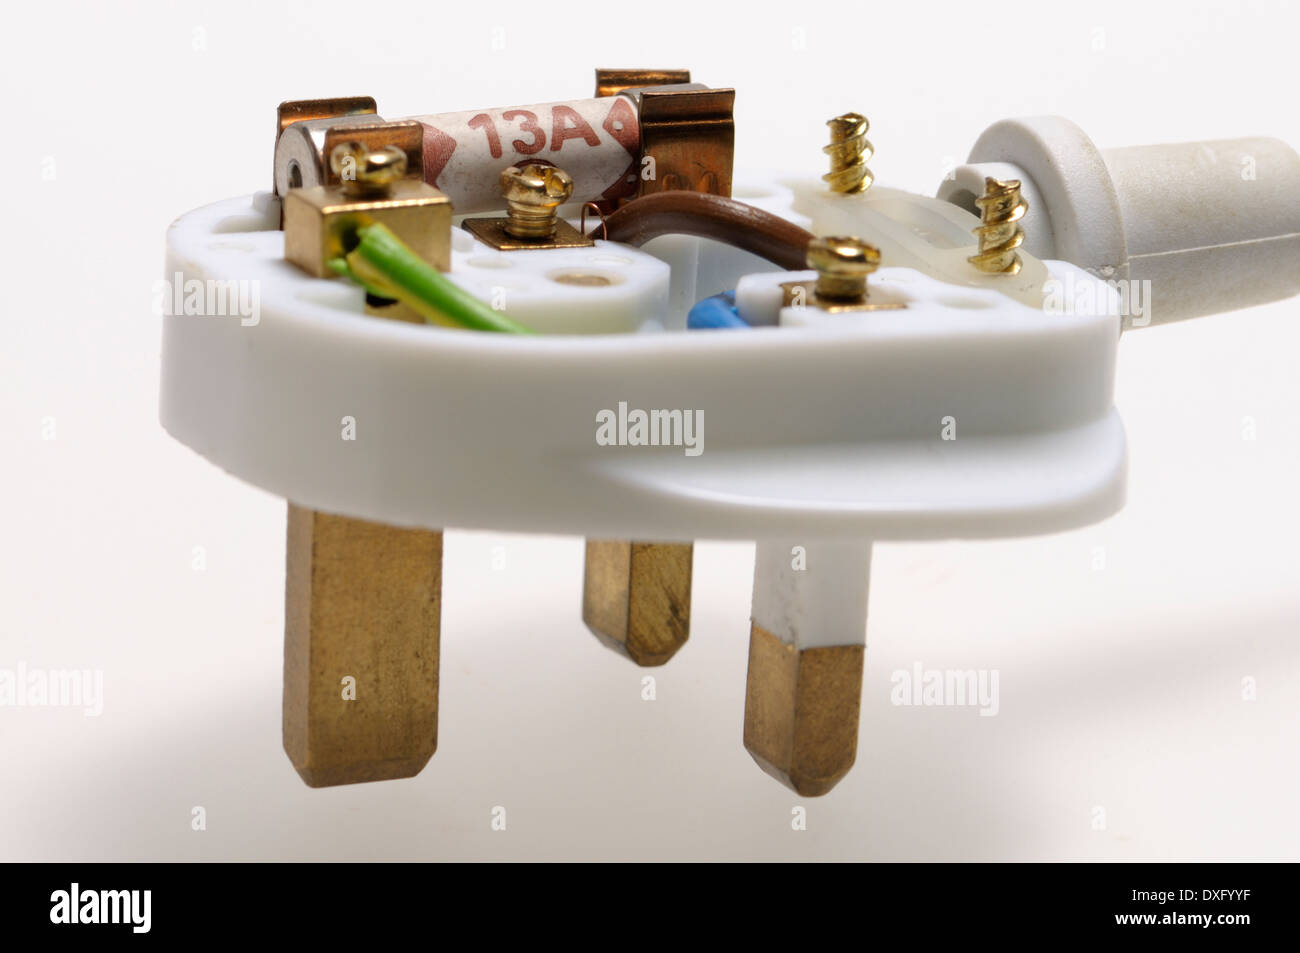 Fuse Stockfotos & Fuse Bilder - Alamy